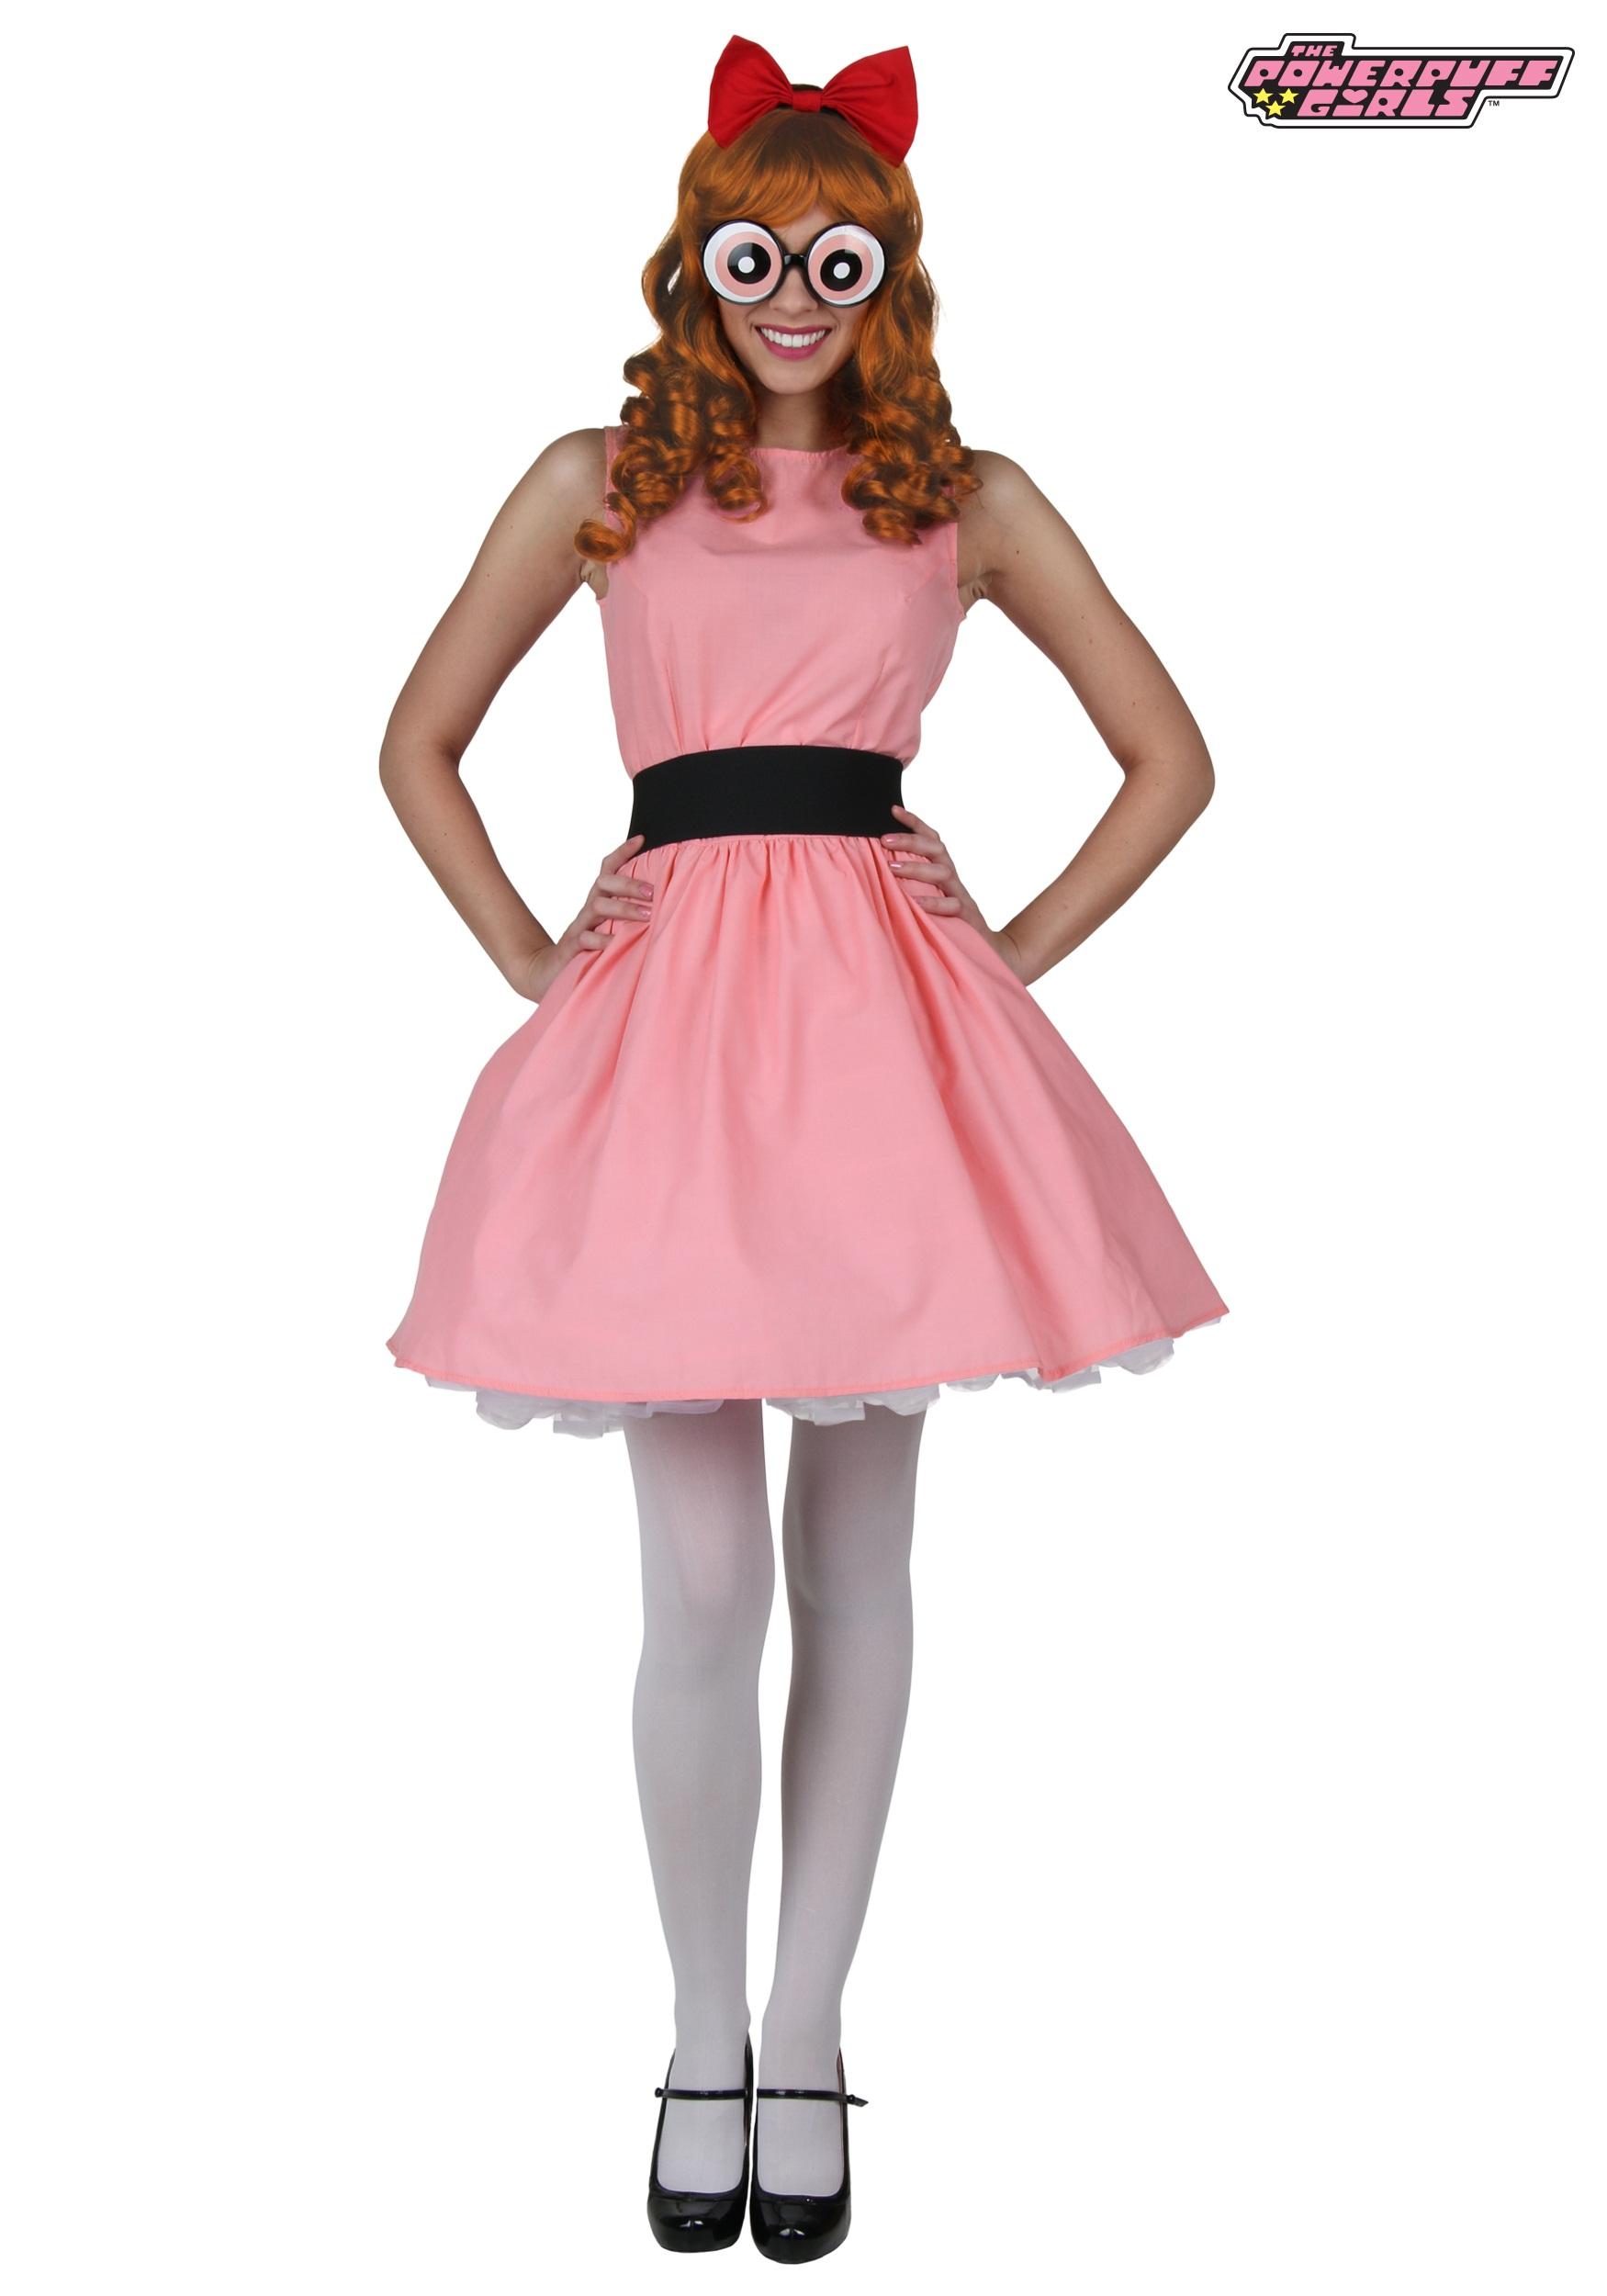 10 plus size halloween costume ideas for grown women stylish curves plus size halloween costume ideas solutioingenieria Choice Image